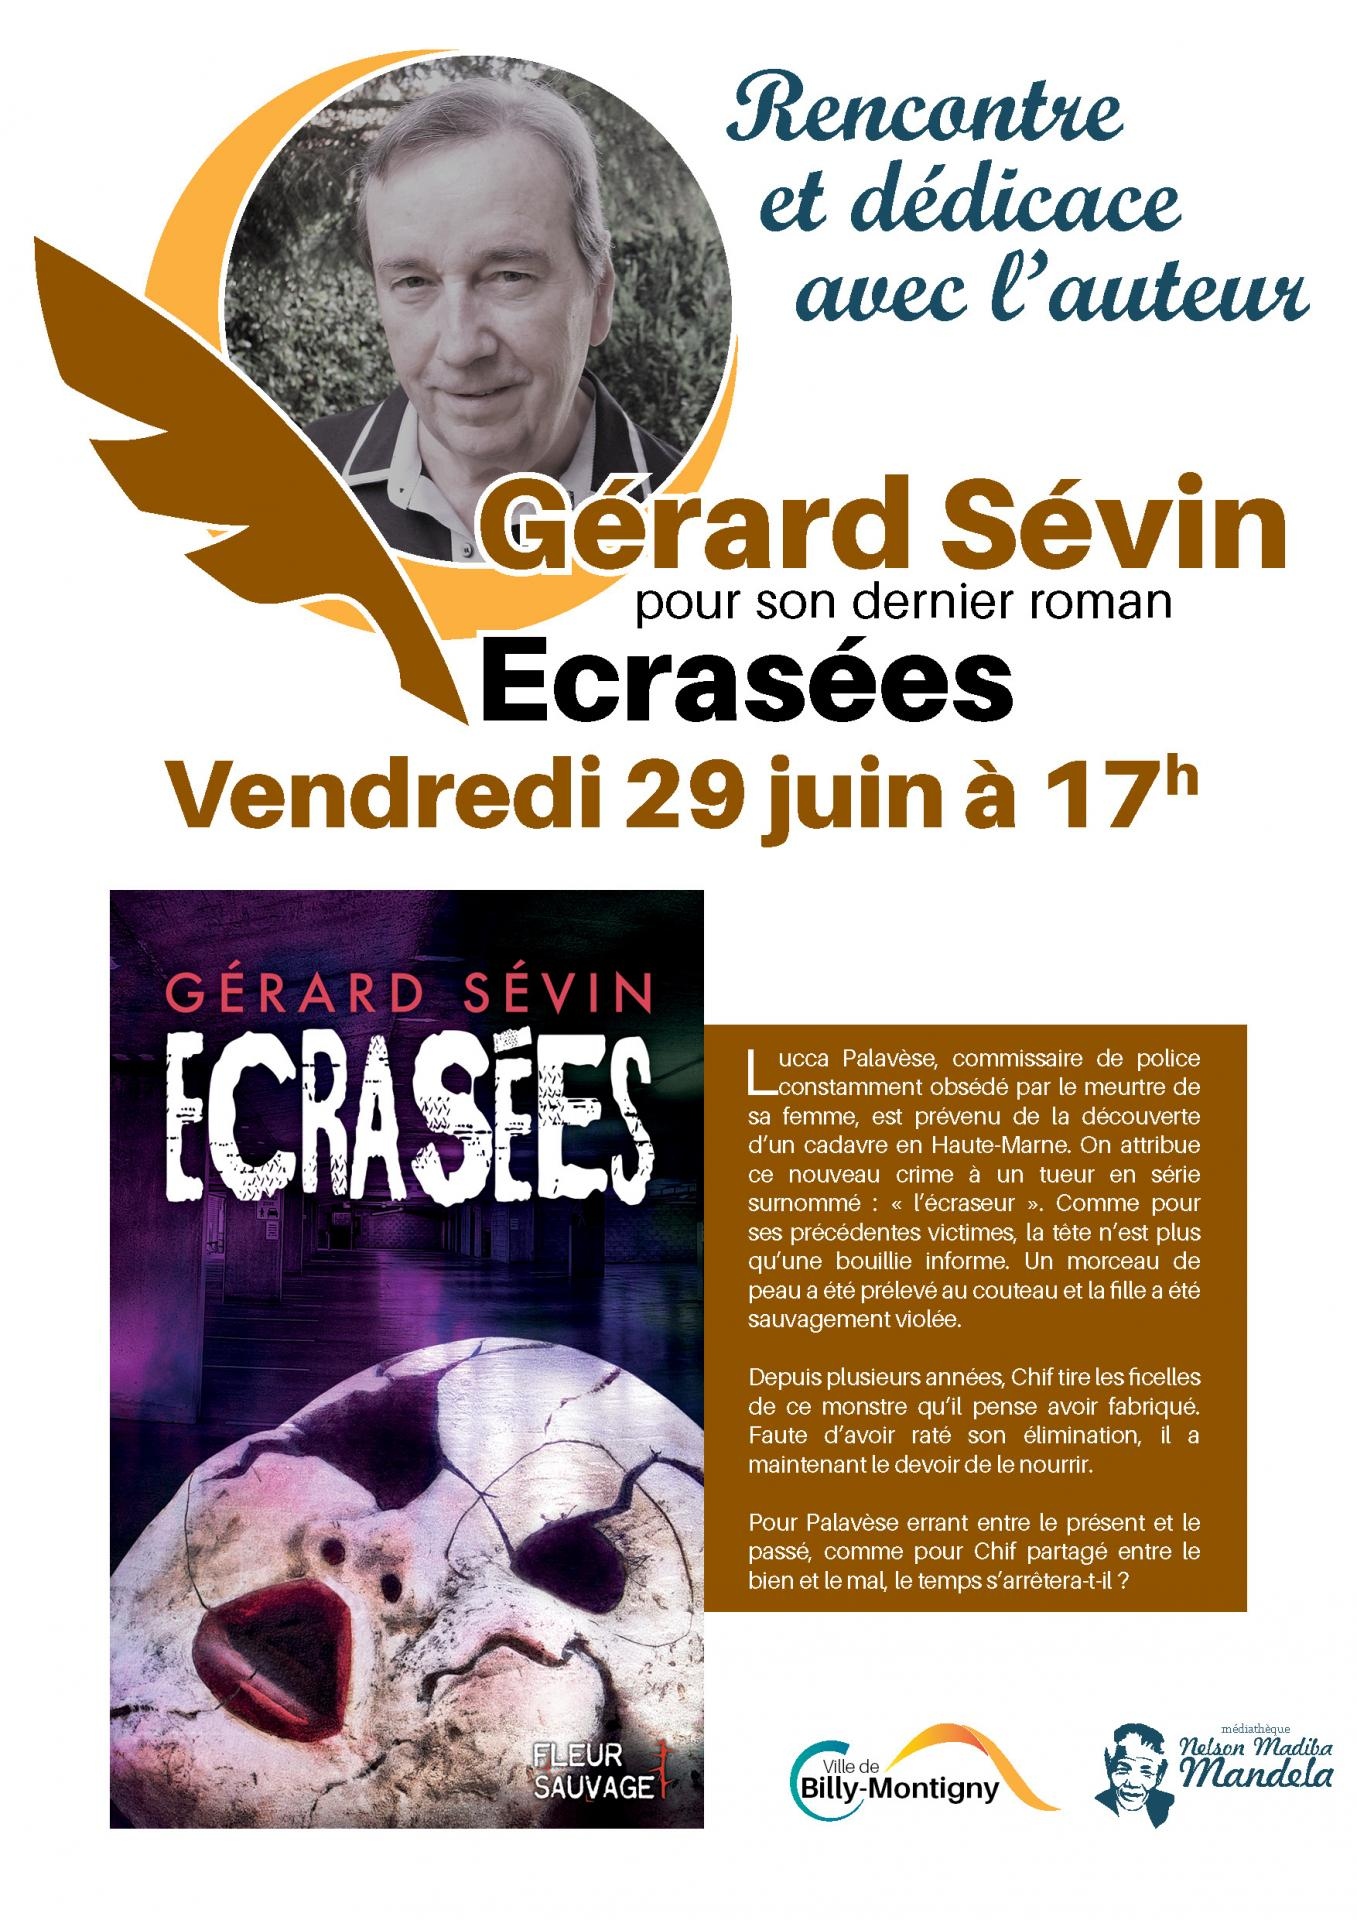 Gerard sevin flyers 29 juin 2018